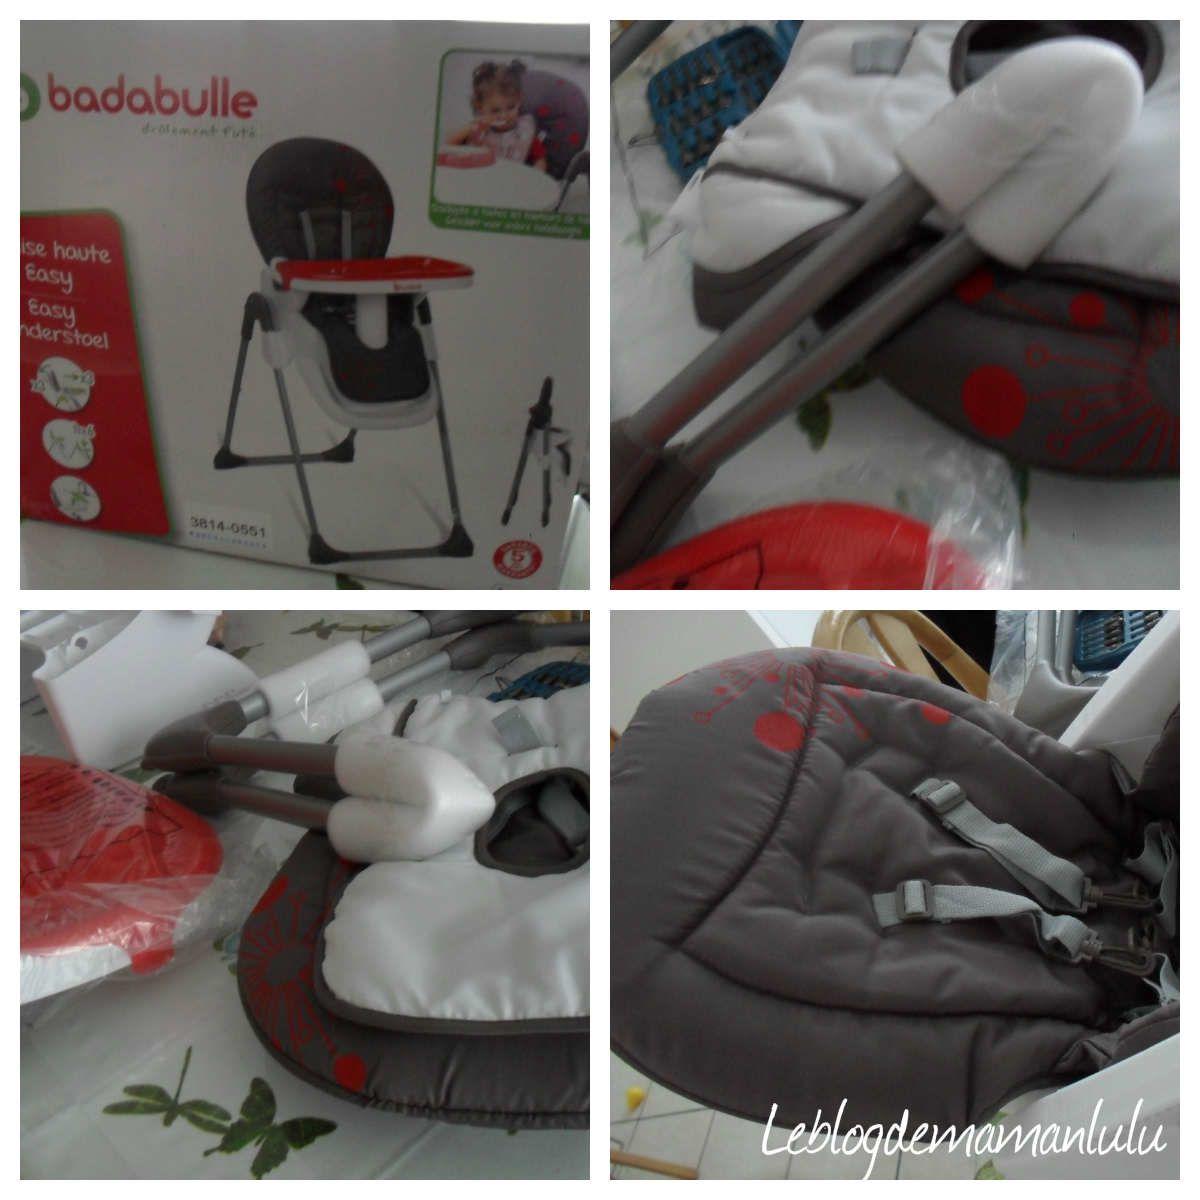 Ptit Doudou teste La chaise Easy de Badabulle {#Test}{#Badabulle}